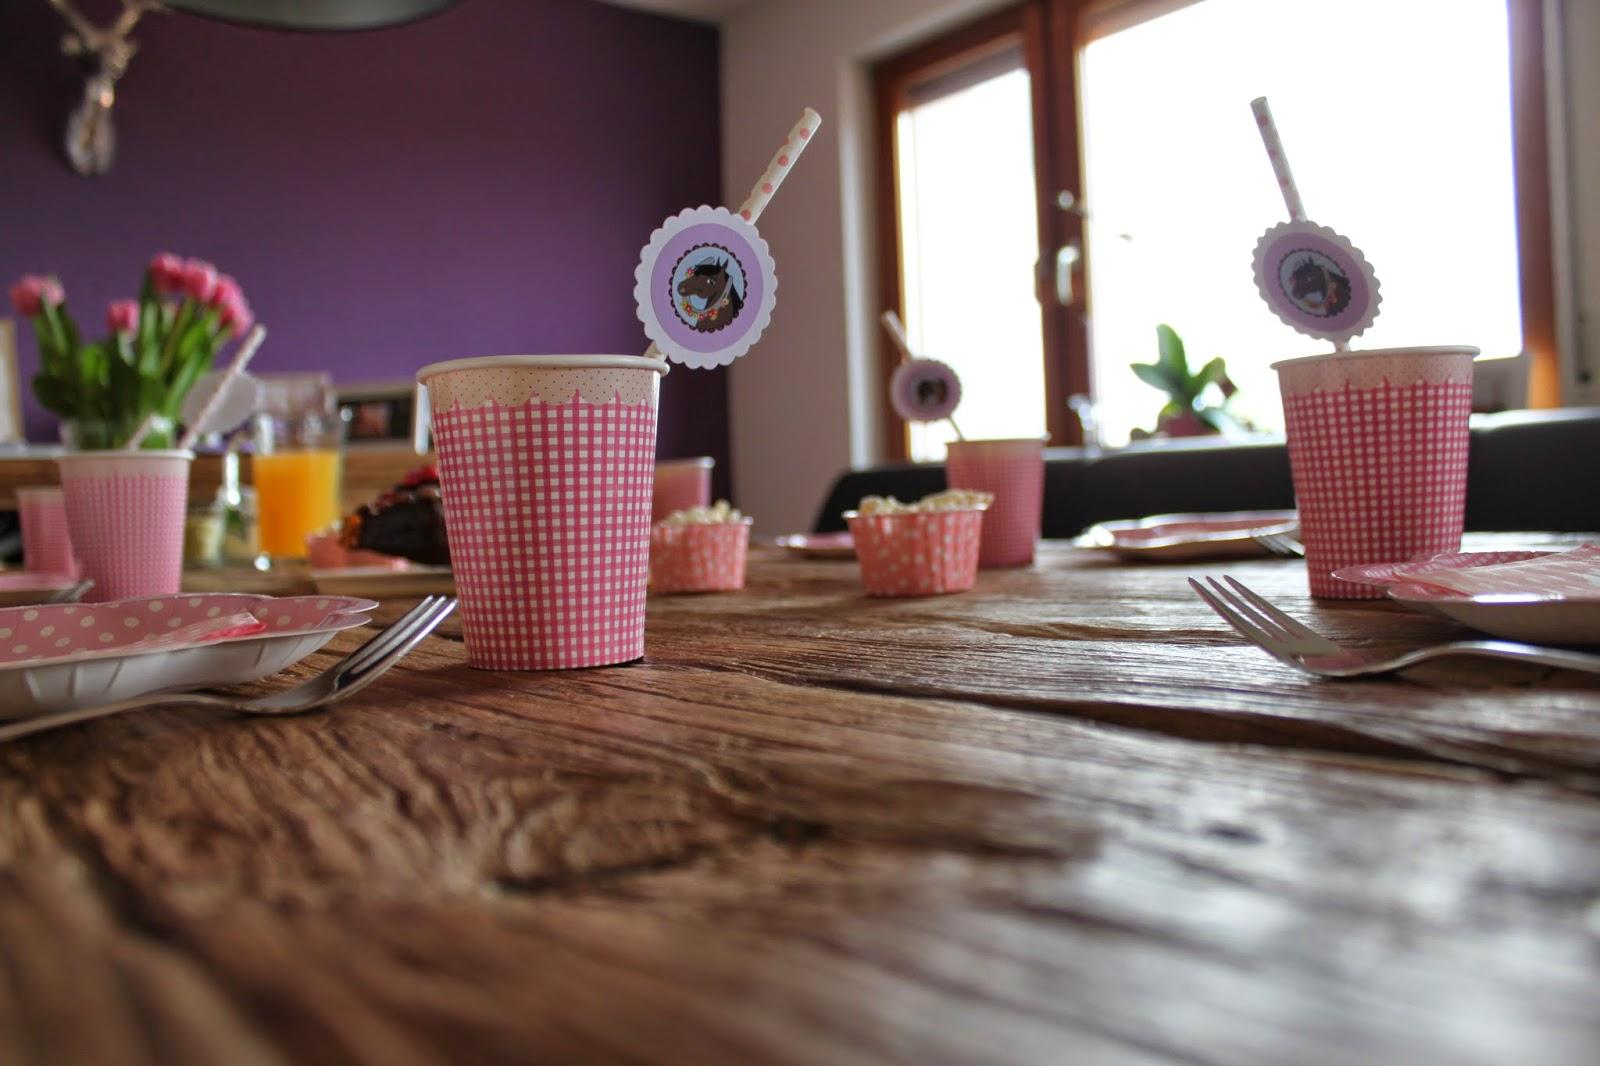 lila haus kindergeburtstag mit dem motto pferde. Black Bedroom Furniture Sets. Home Design Ideas